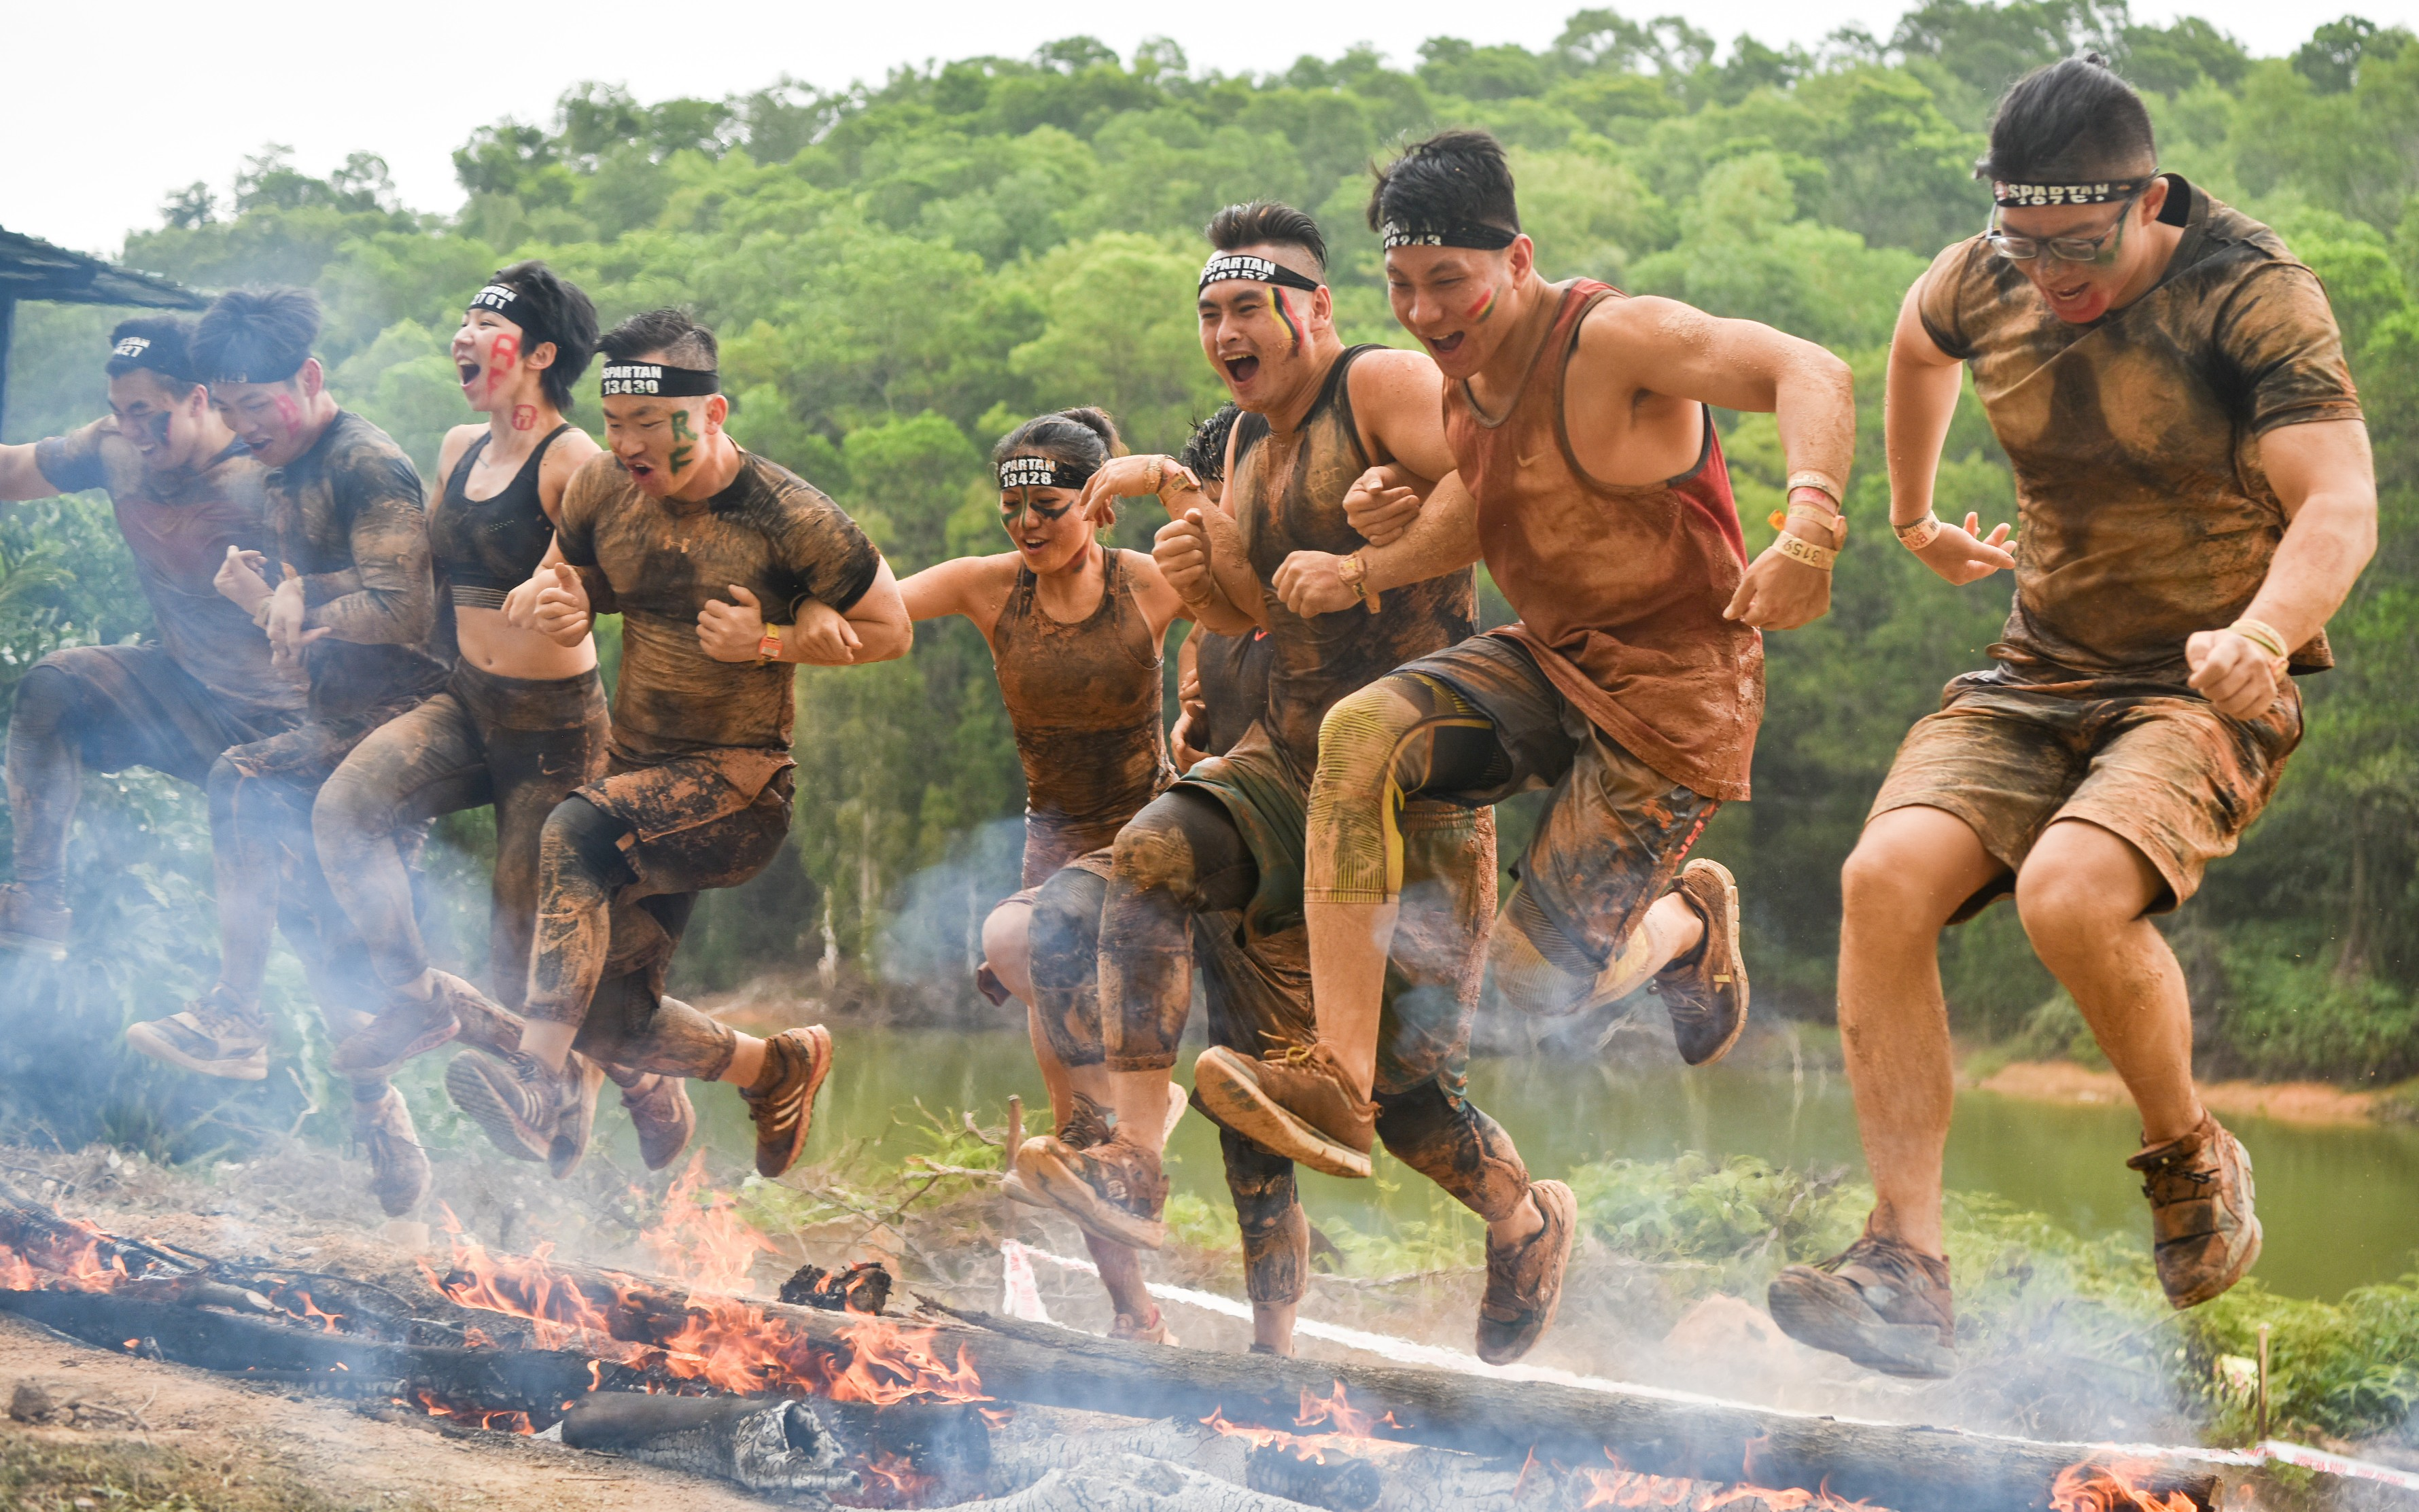 Spartan Singapore Obstacle Course Races 7a1862447bb